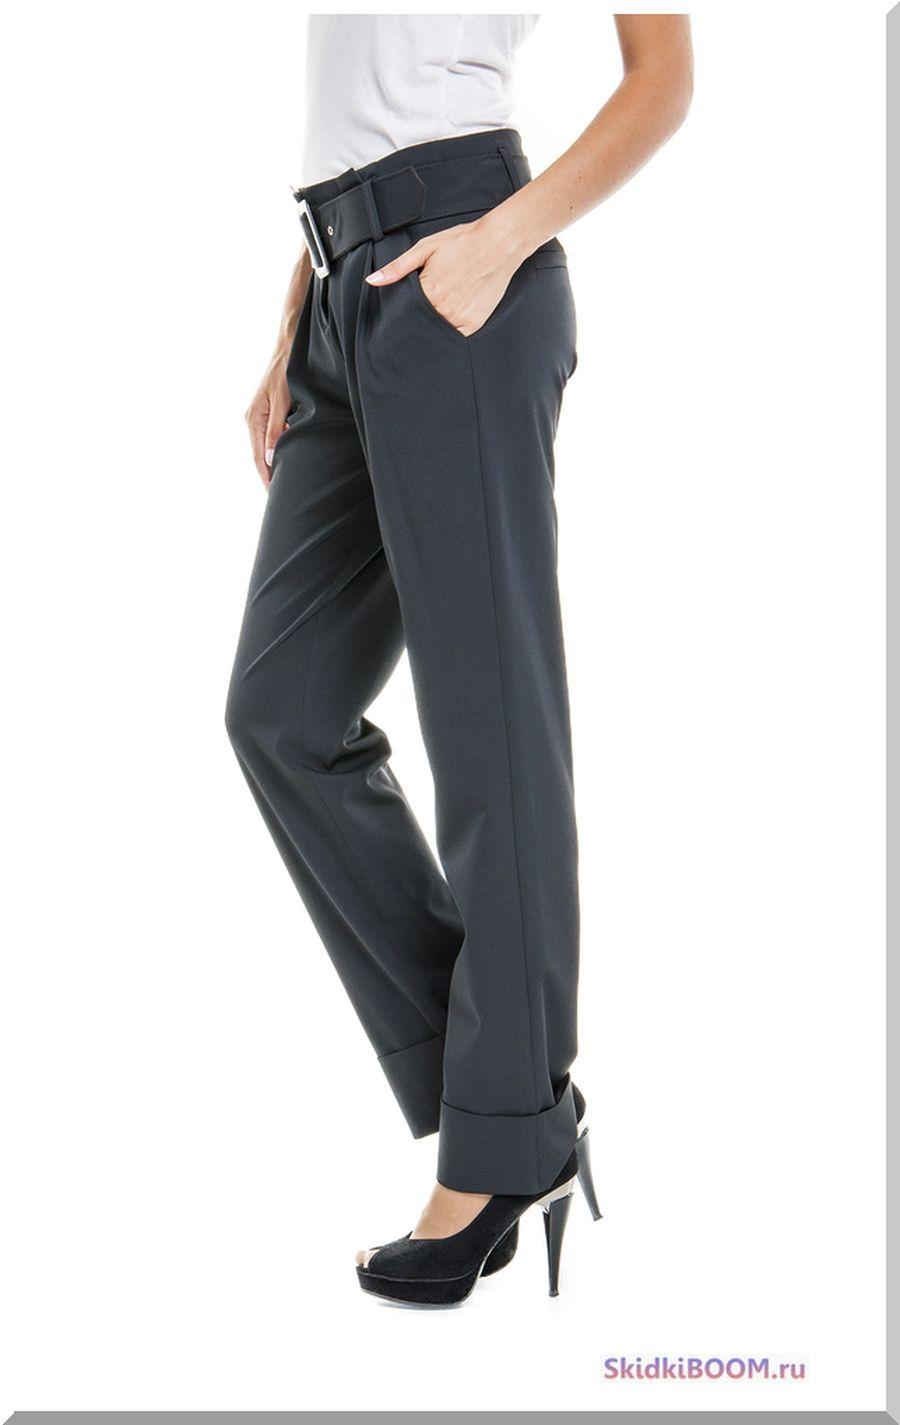 Какие женские брюки в моде - с манжетами